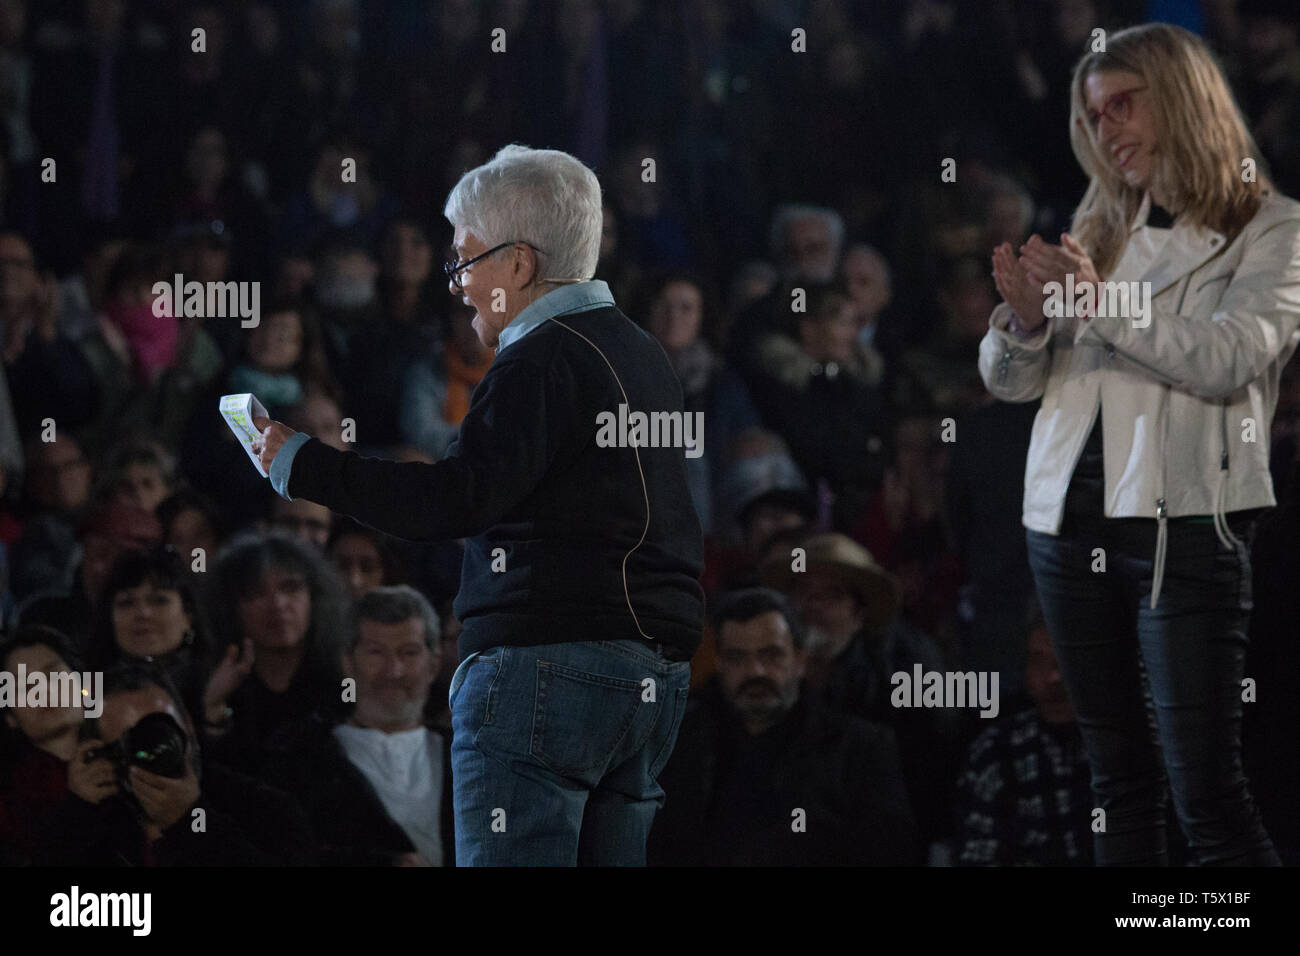 Madrid, Spain. 26th Apr, 2019. Boti leader of LGTBI movement. Credit: Lev Radin/Pacific Press/Alamy Live News - Stock Image